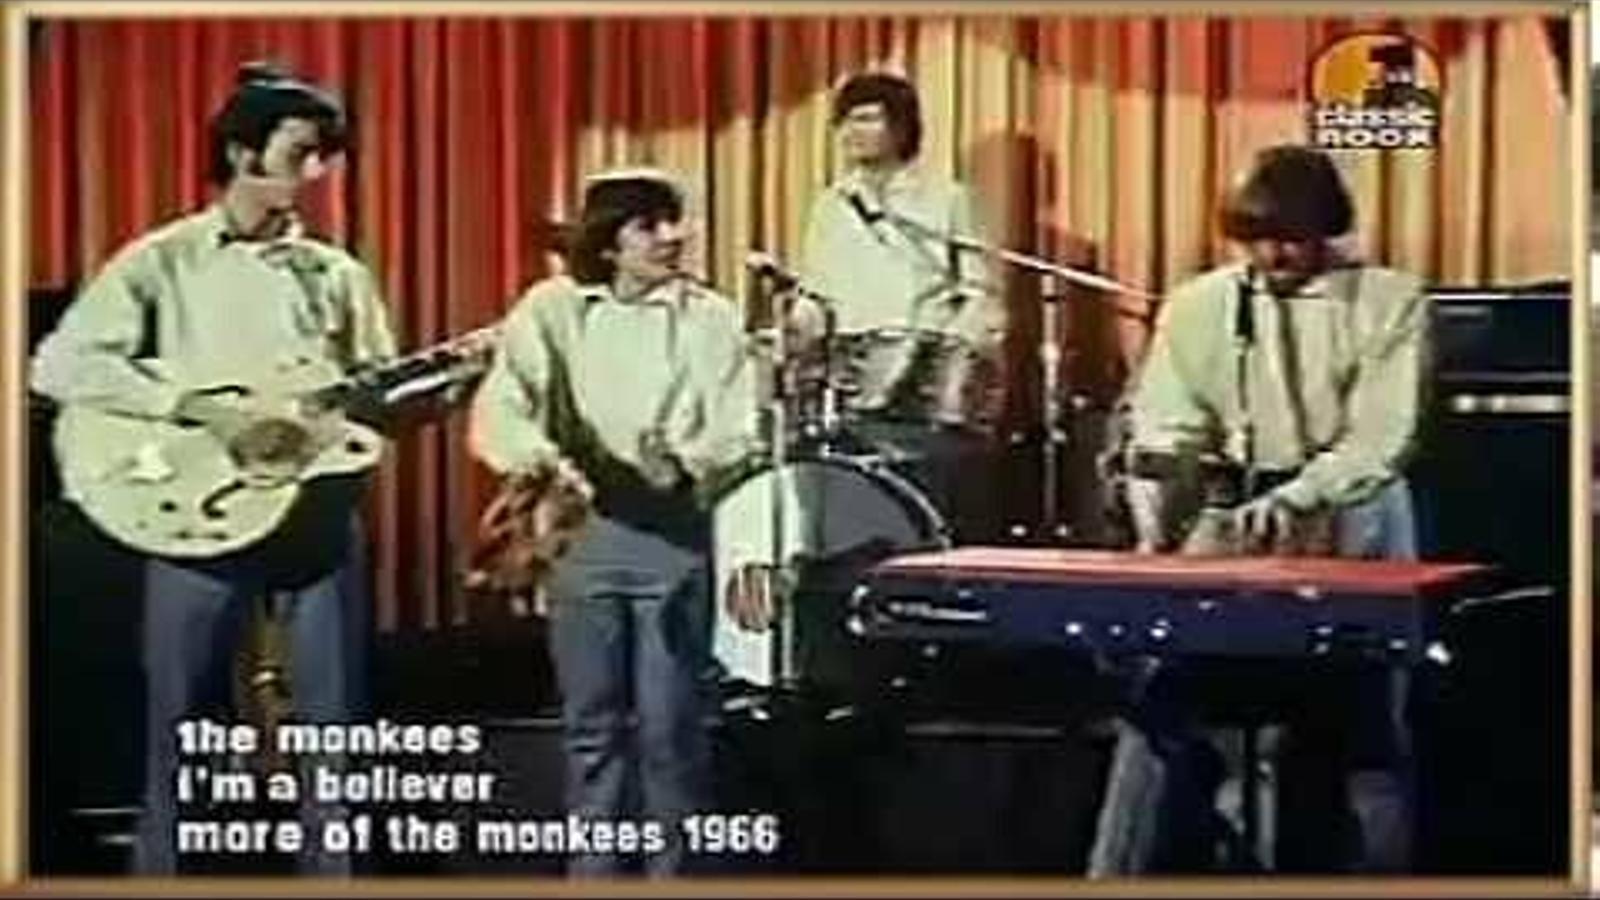 'I'm a believer' de The Monkees